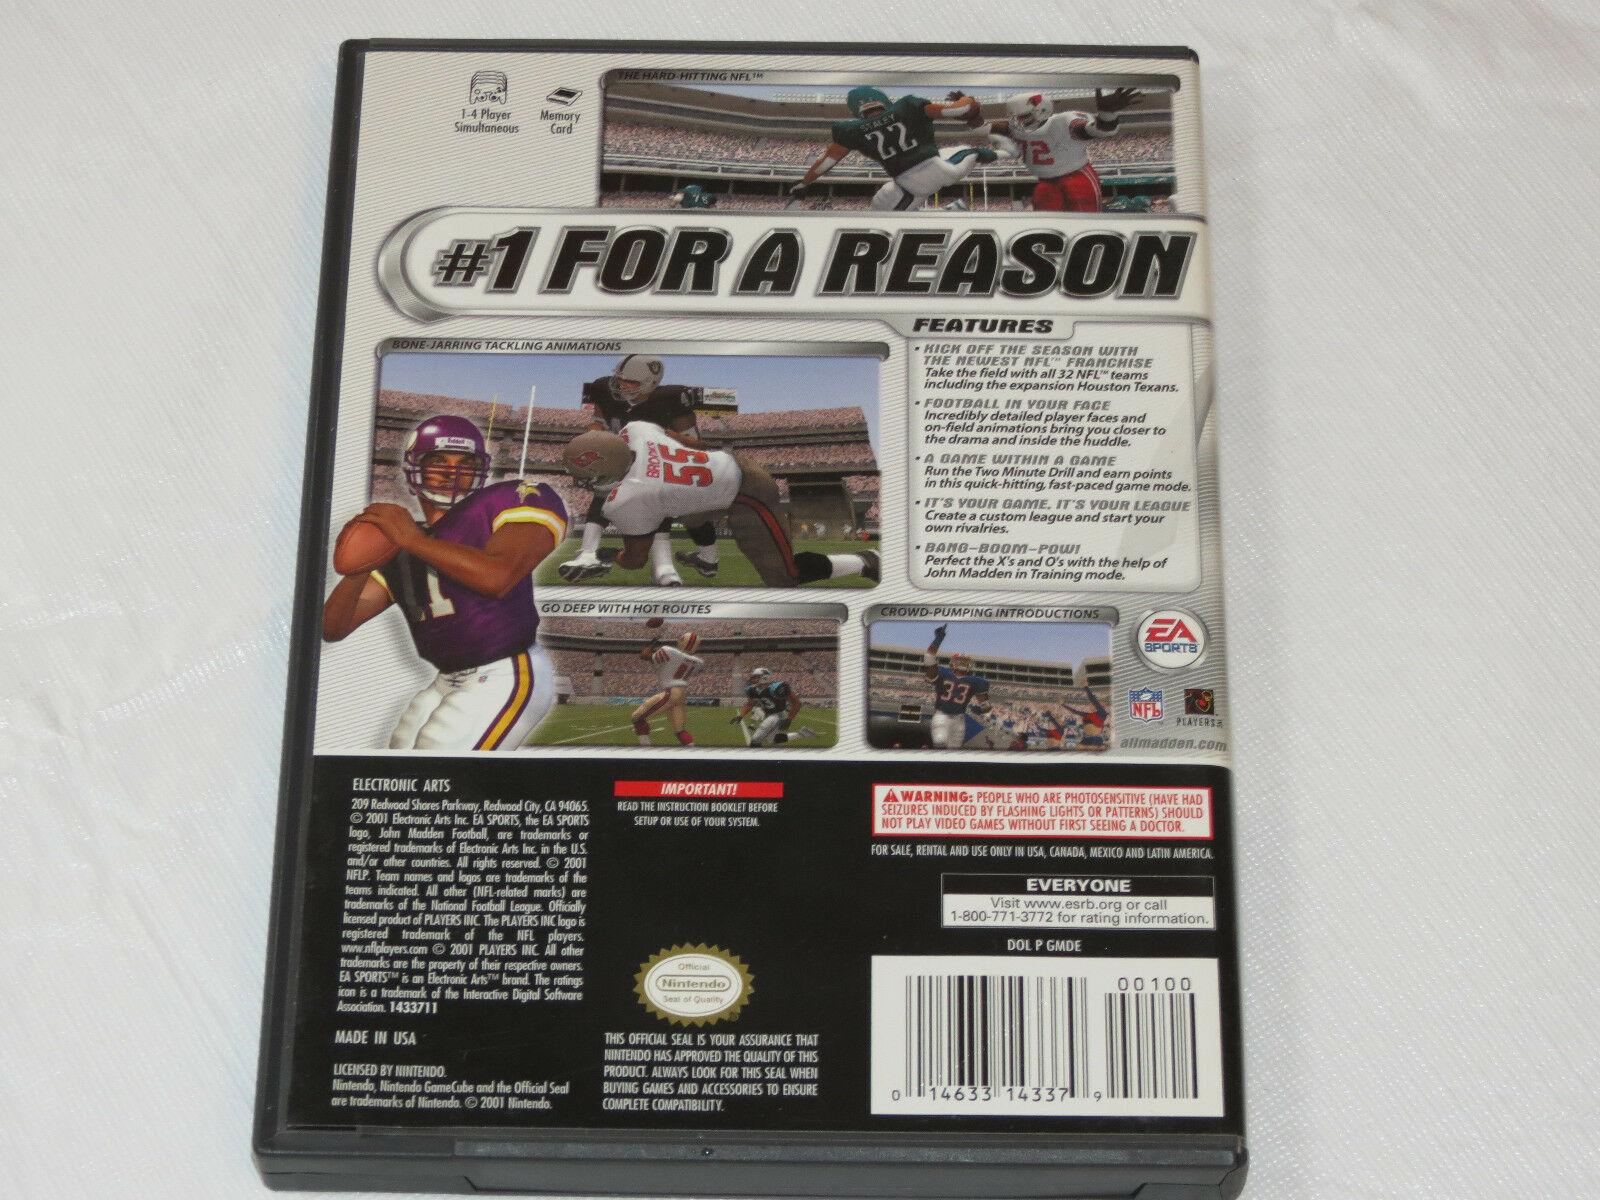 Enloquecer NFL 2002 Nintendo Gamecube 2001 Fútbol Videojuego E-Everyone 25481 image 3